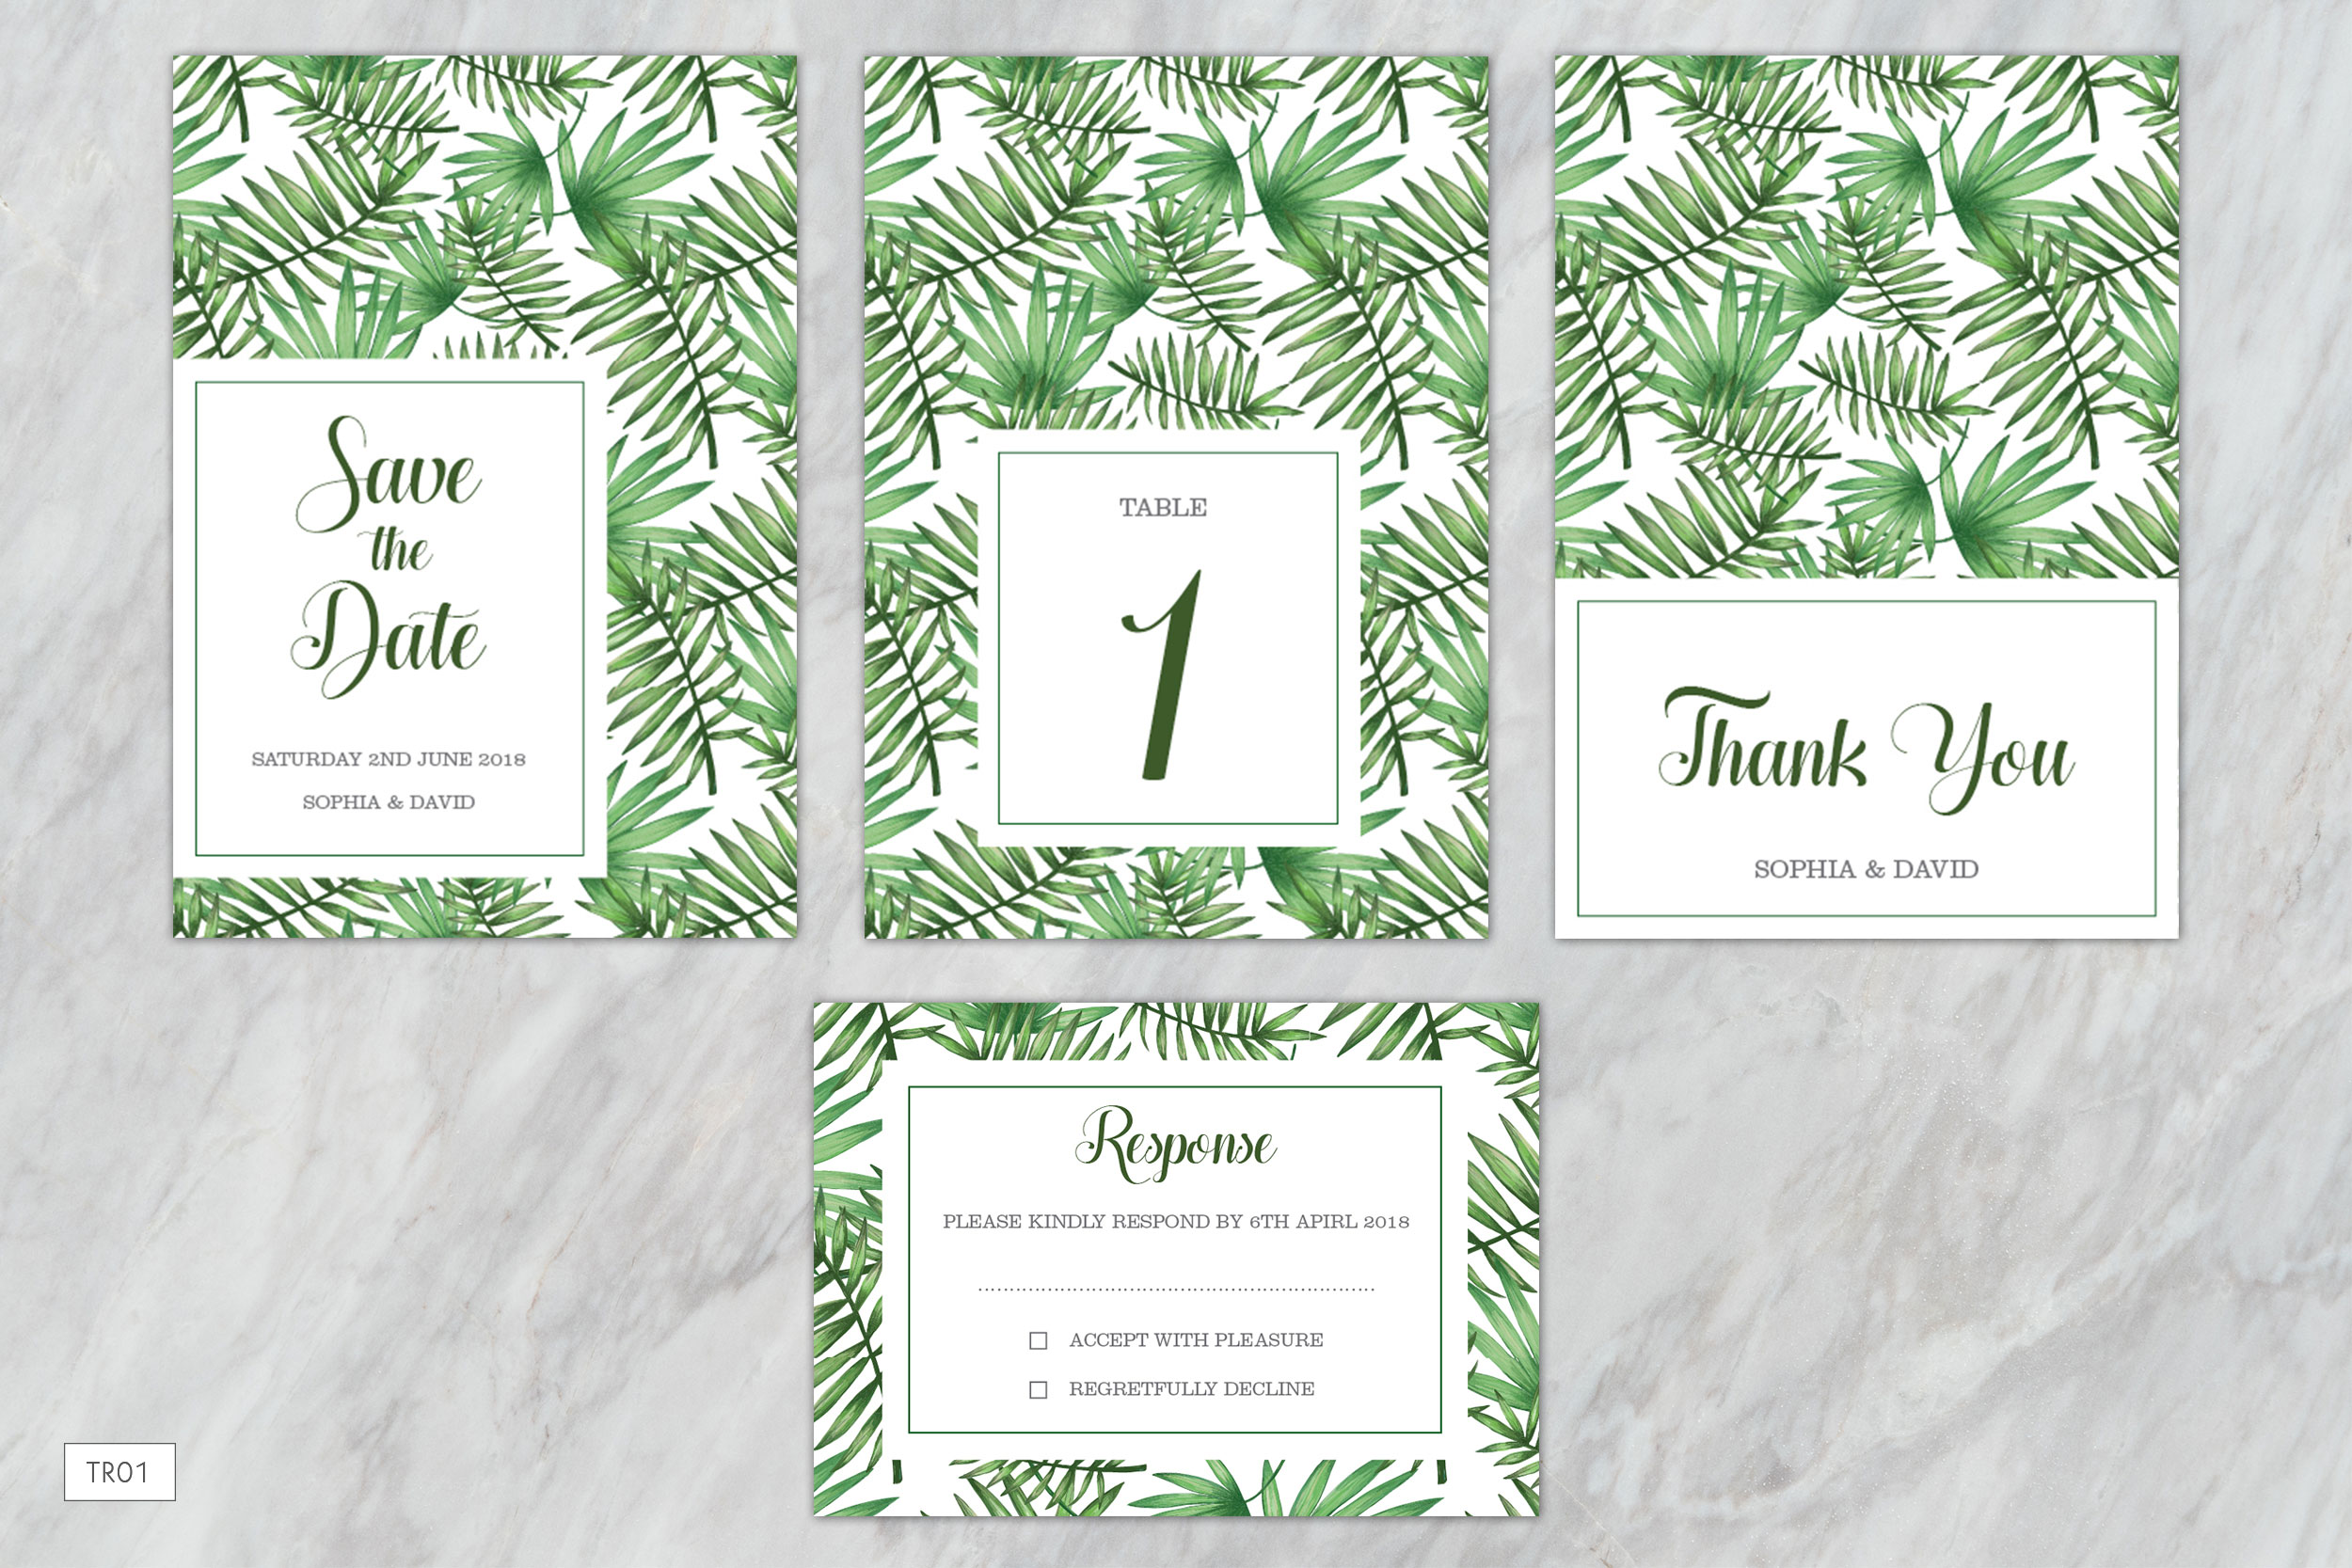 tropics-wedding-invitation-set.jpg